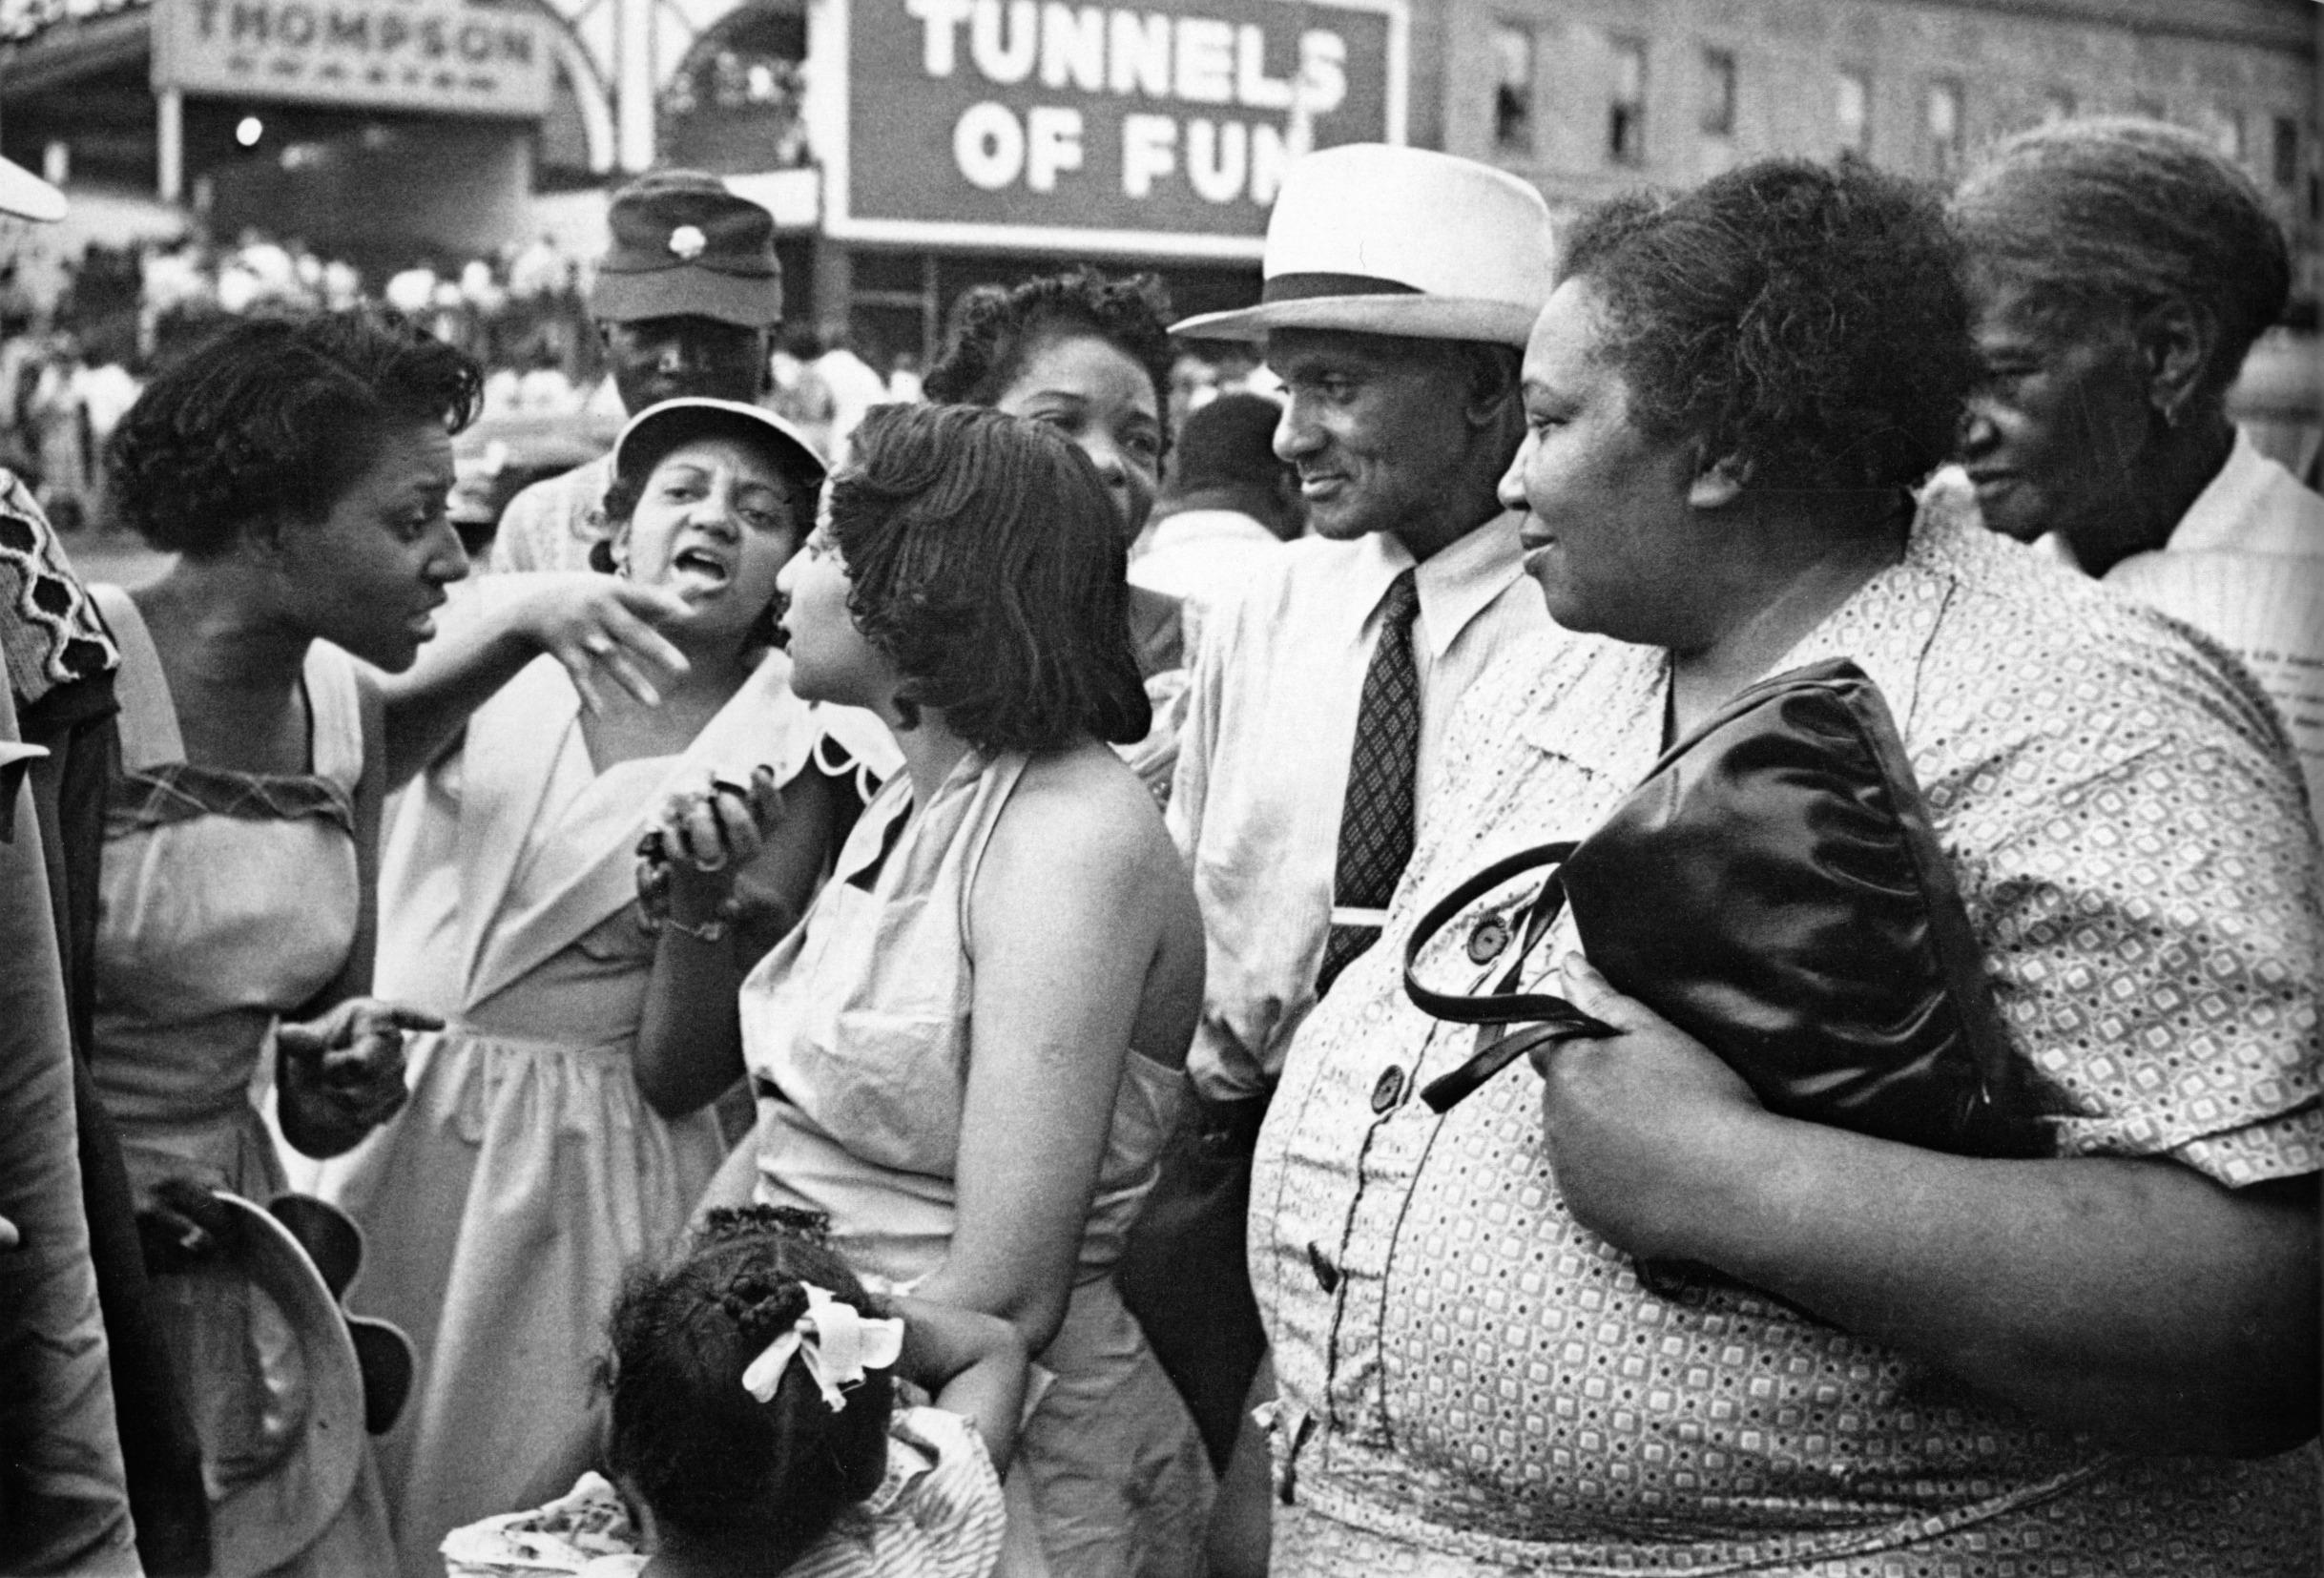 Coney Island, 1947-1951